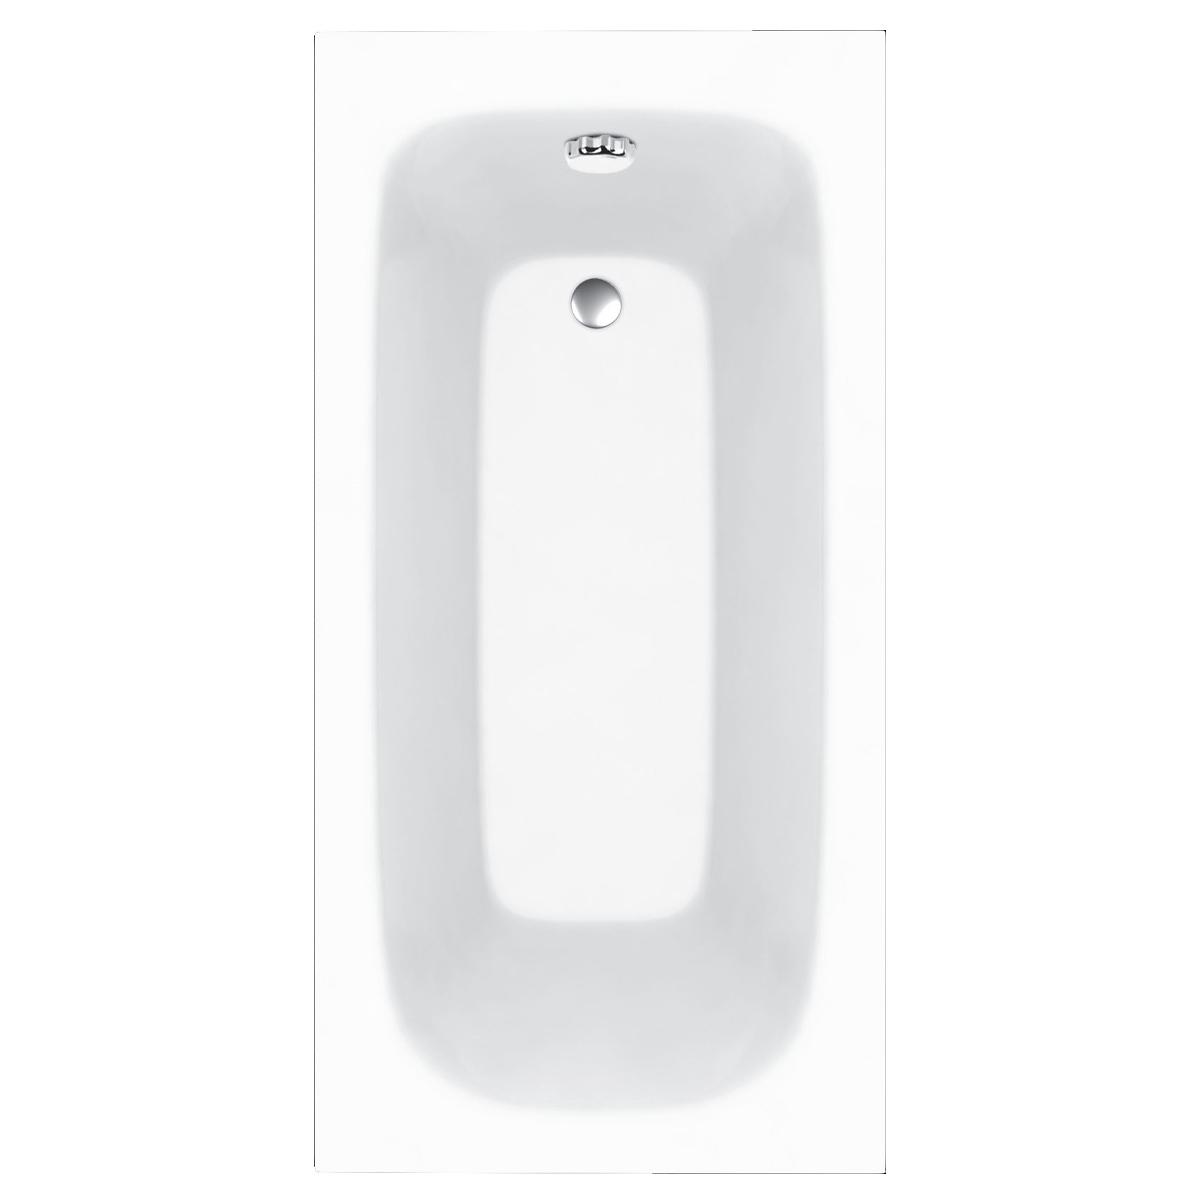 K-Vit G4K 1400 x 700 Contract Bath